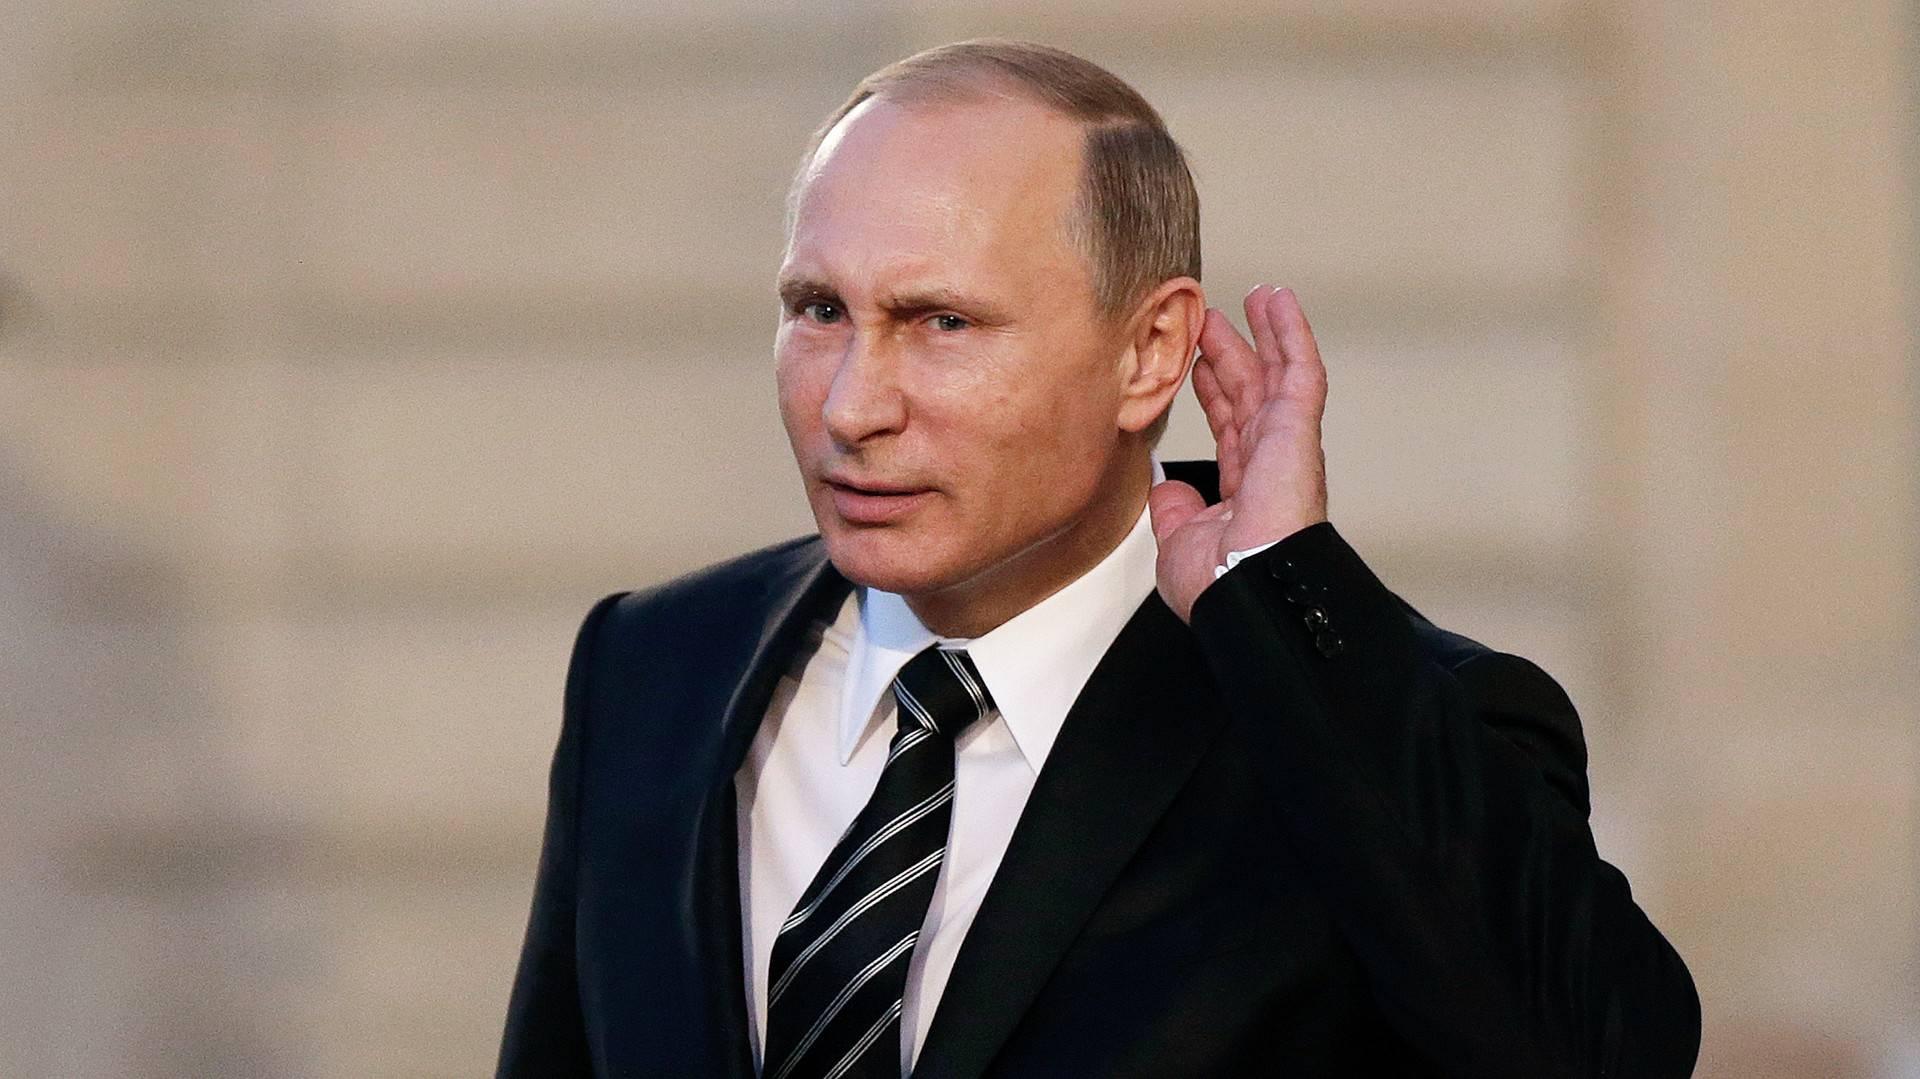 Putin Greta Thunberg